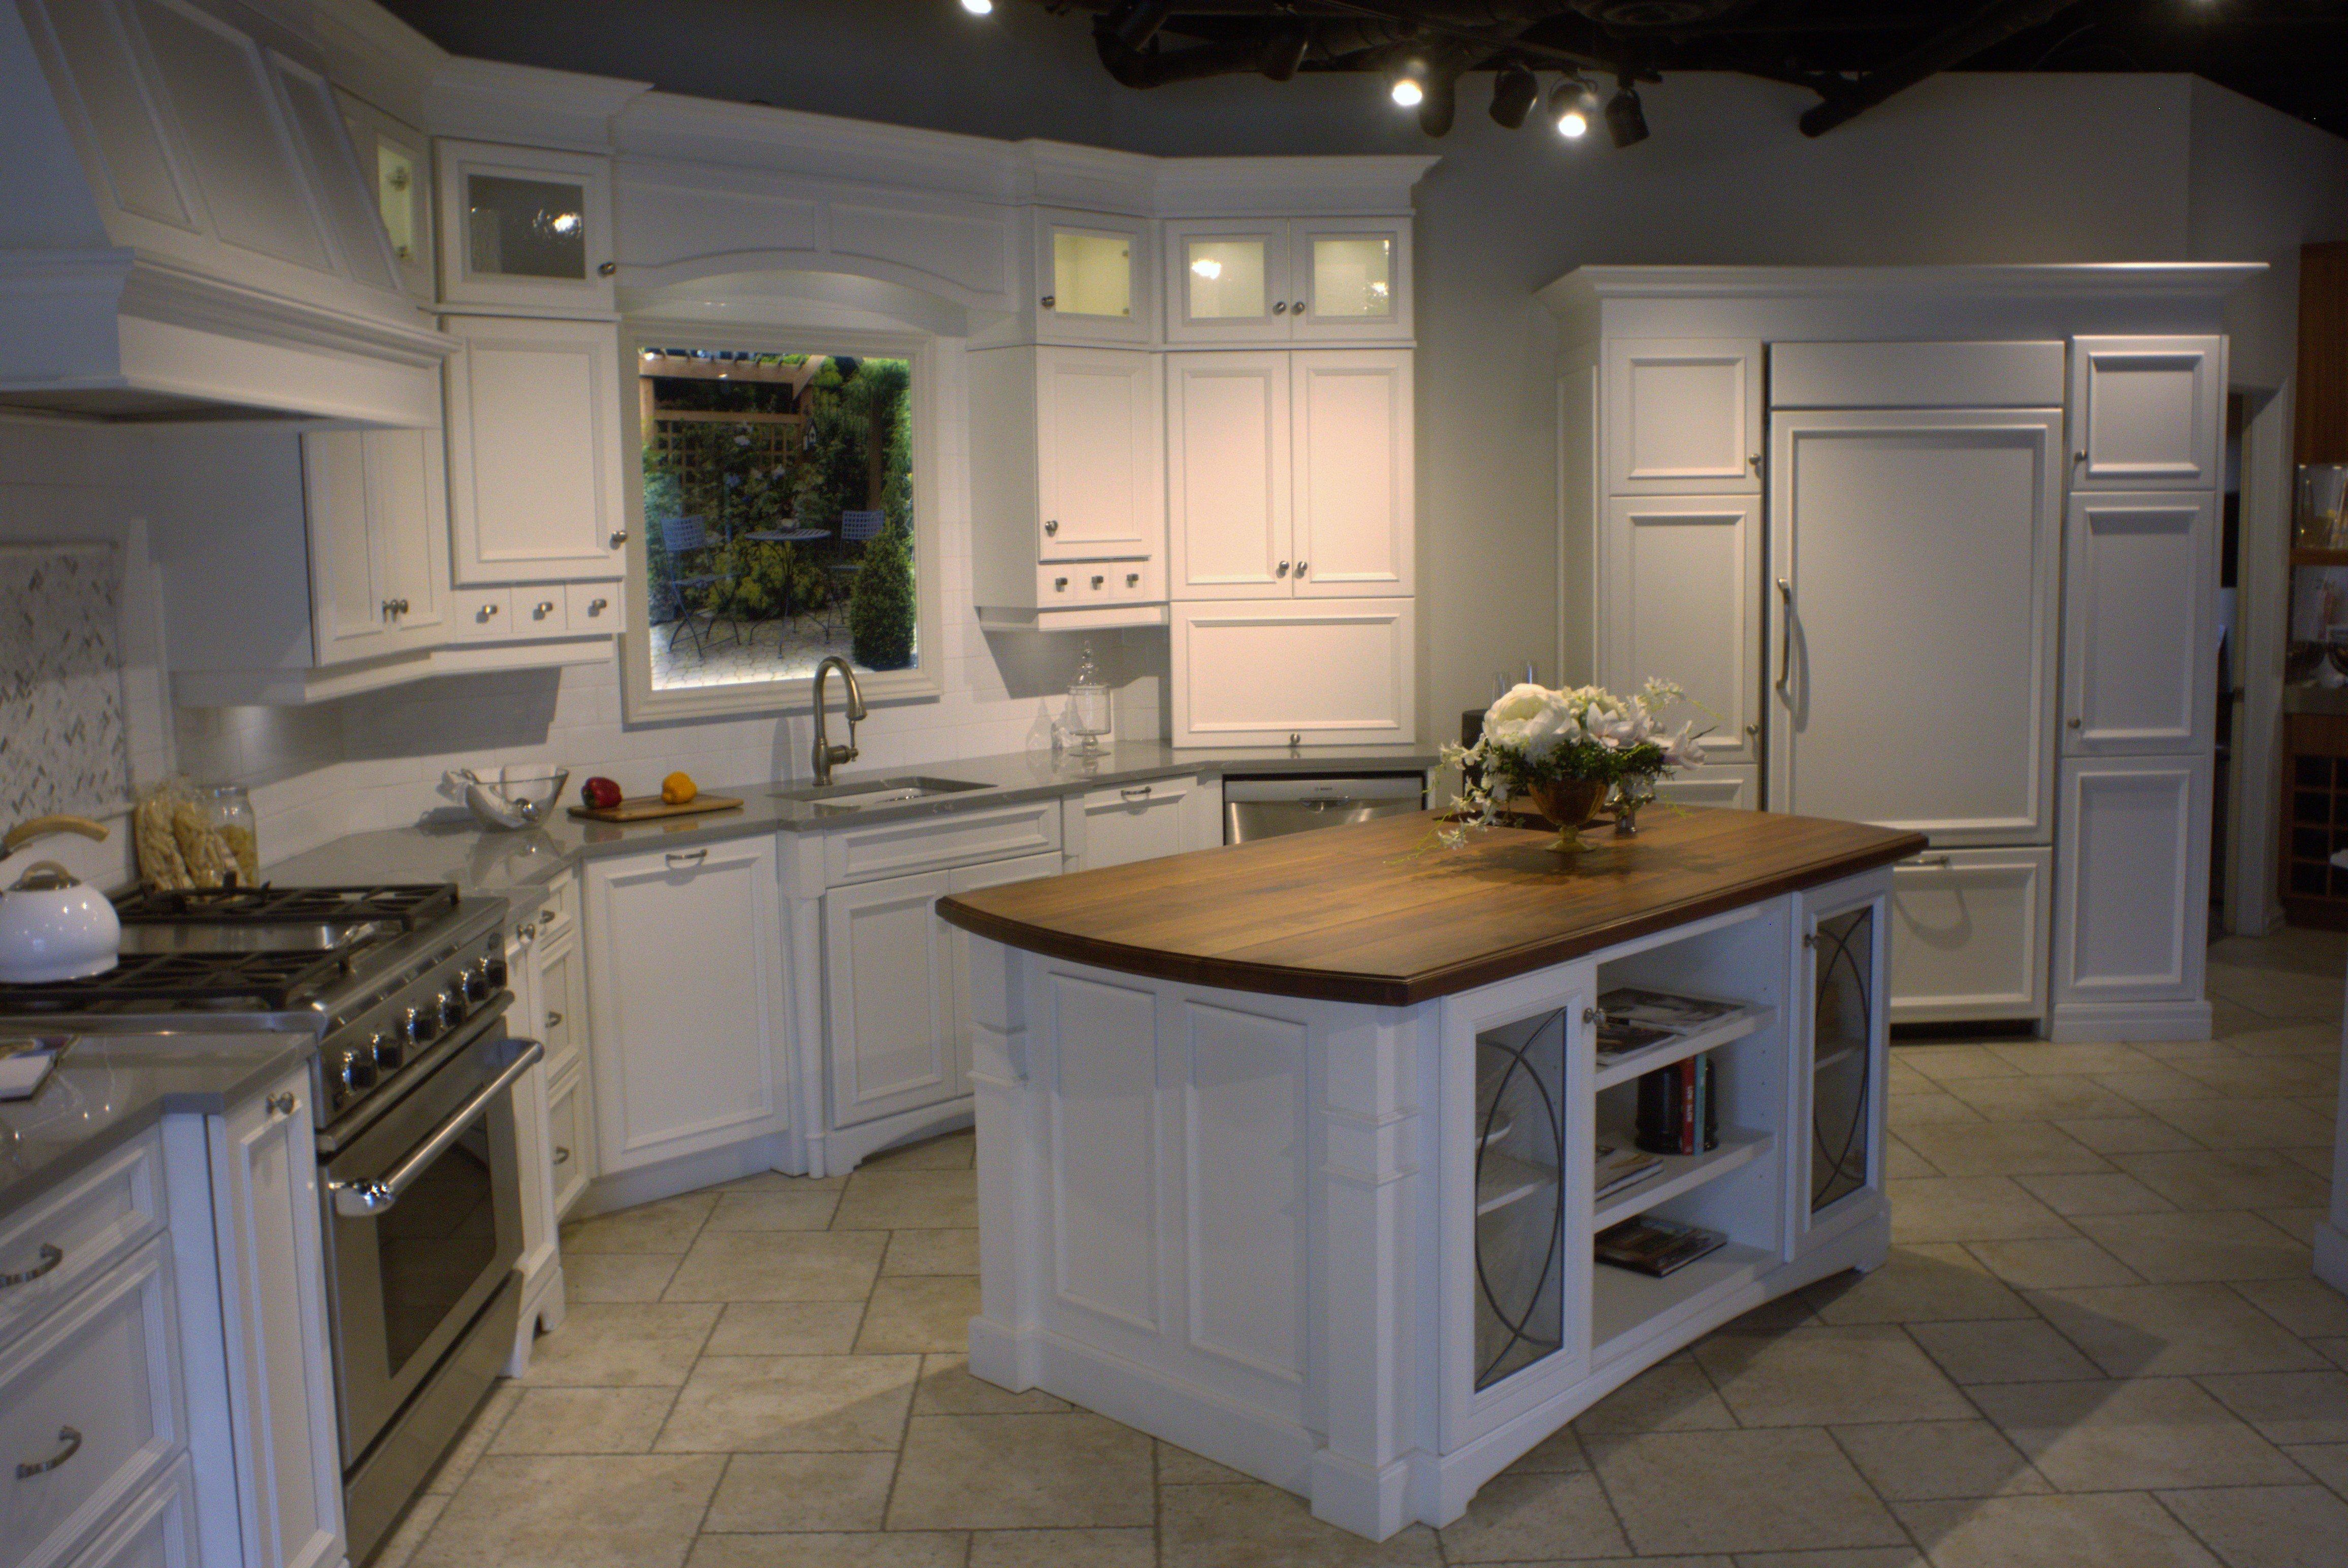 A model kitchen using the Inglefield door style.